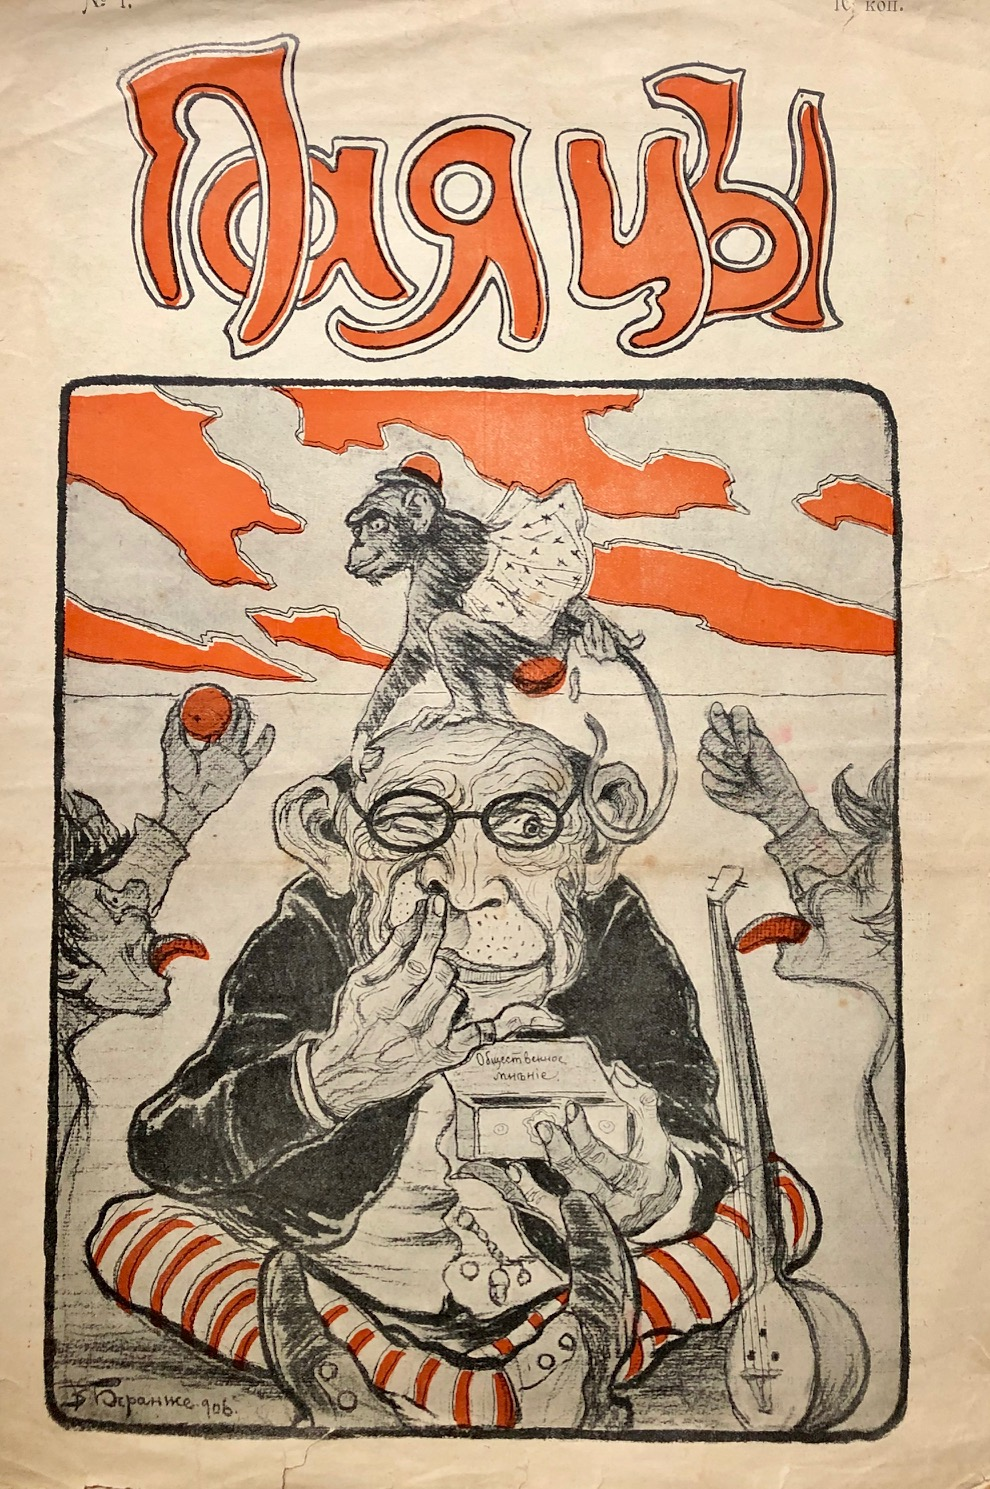 Lot 493 - Les arlequins. Паяцы. Журнал политической сатиры. 1906 [...]